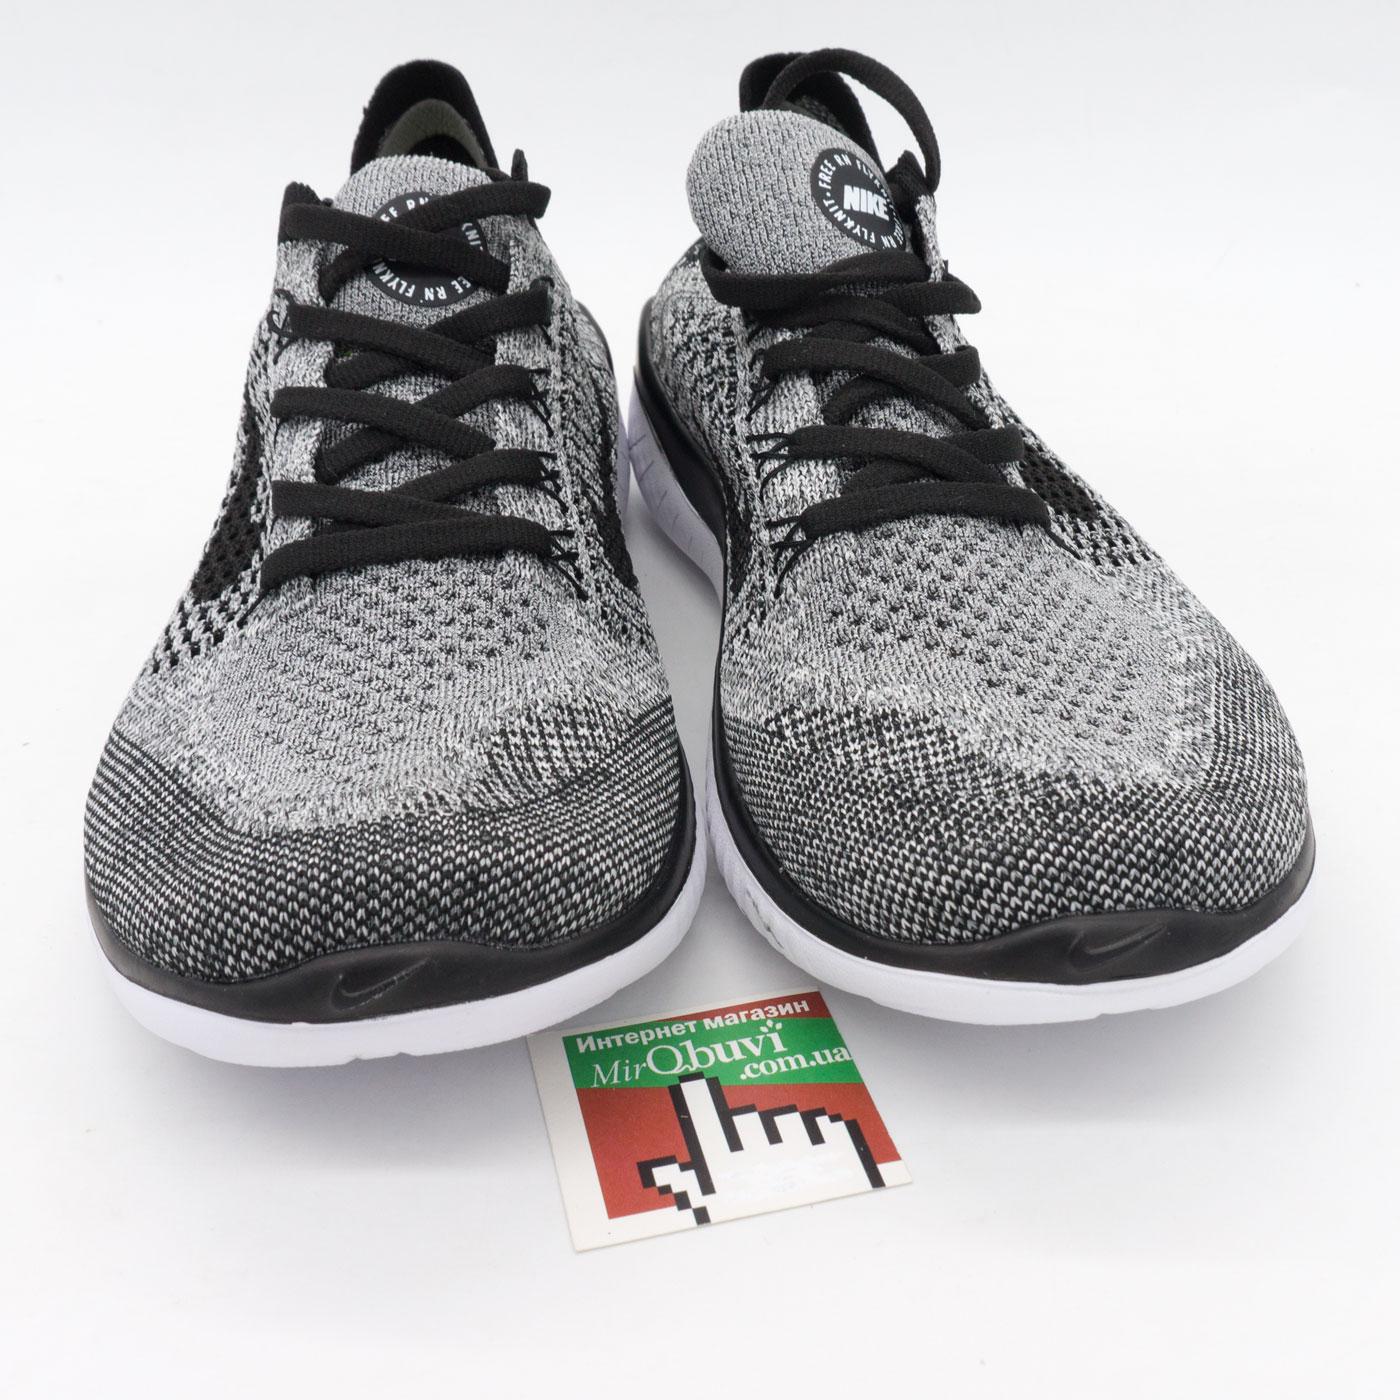 фото bottom Кроссовки для бега Nike Free Run Flyknit Найк Фри Ран, серые bottom